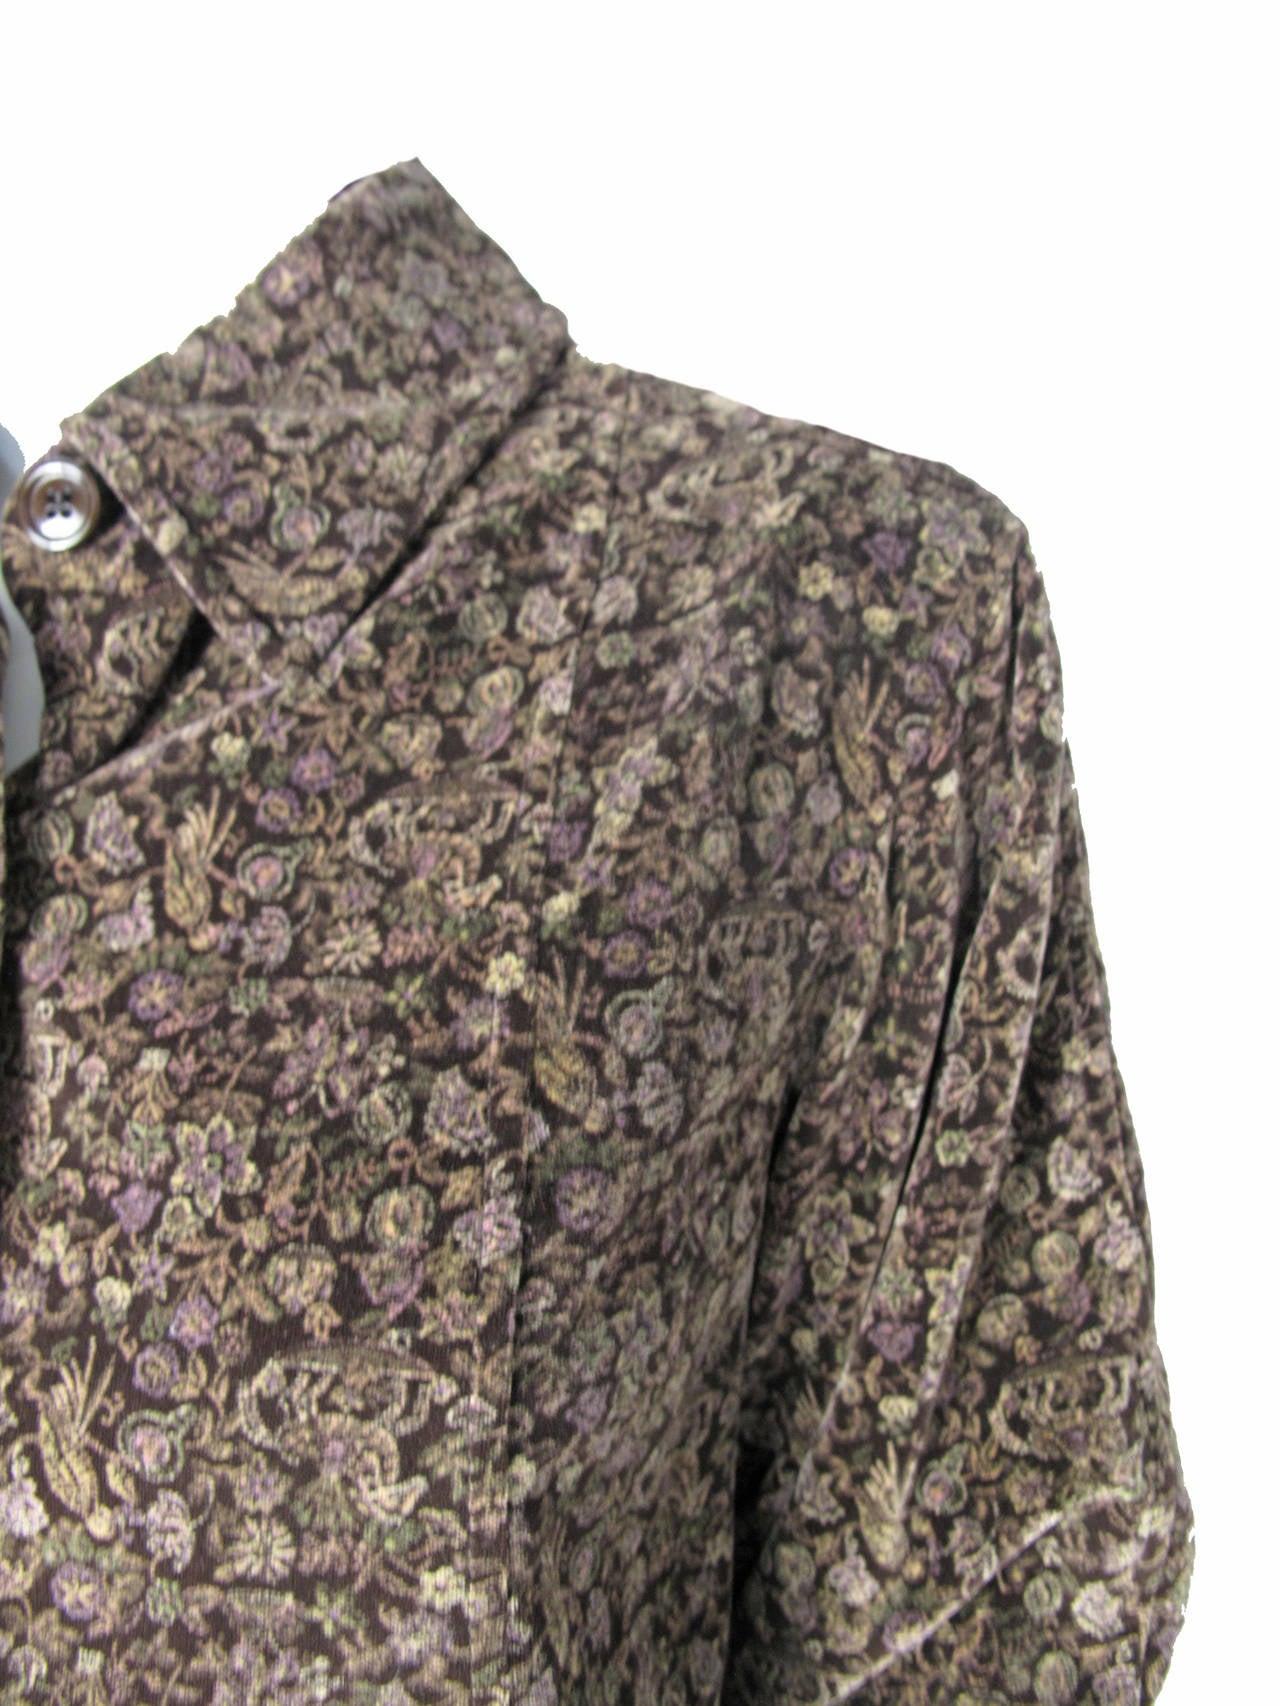 Women's 1970s Oscar de la Renta Velvet Jacket and Wool Skirt For Sale